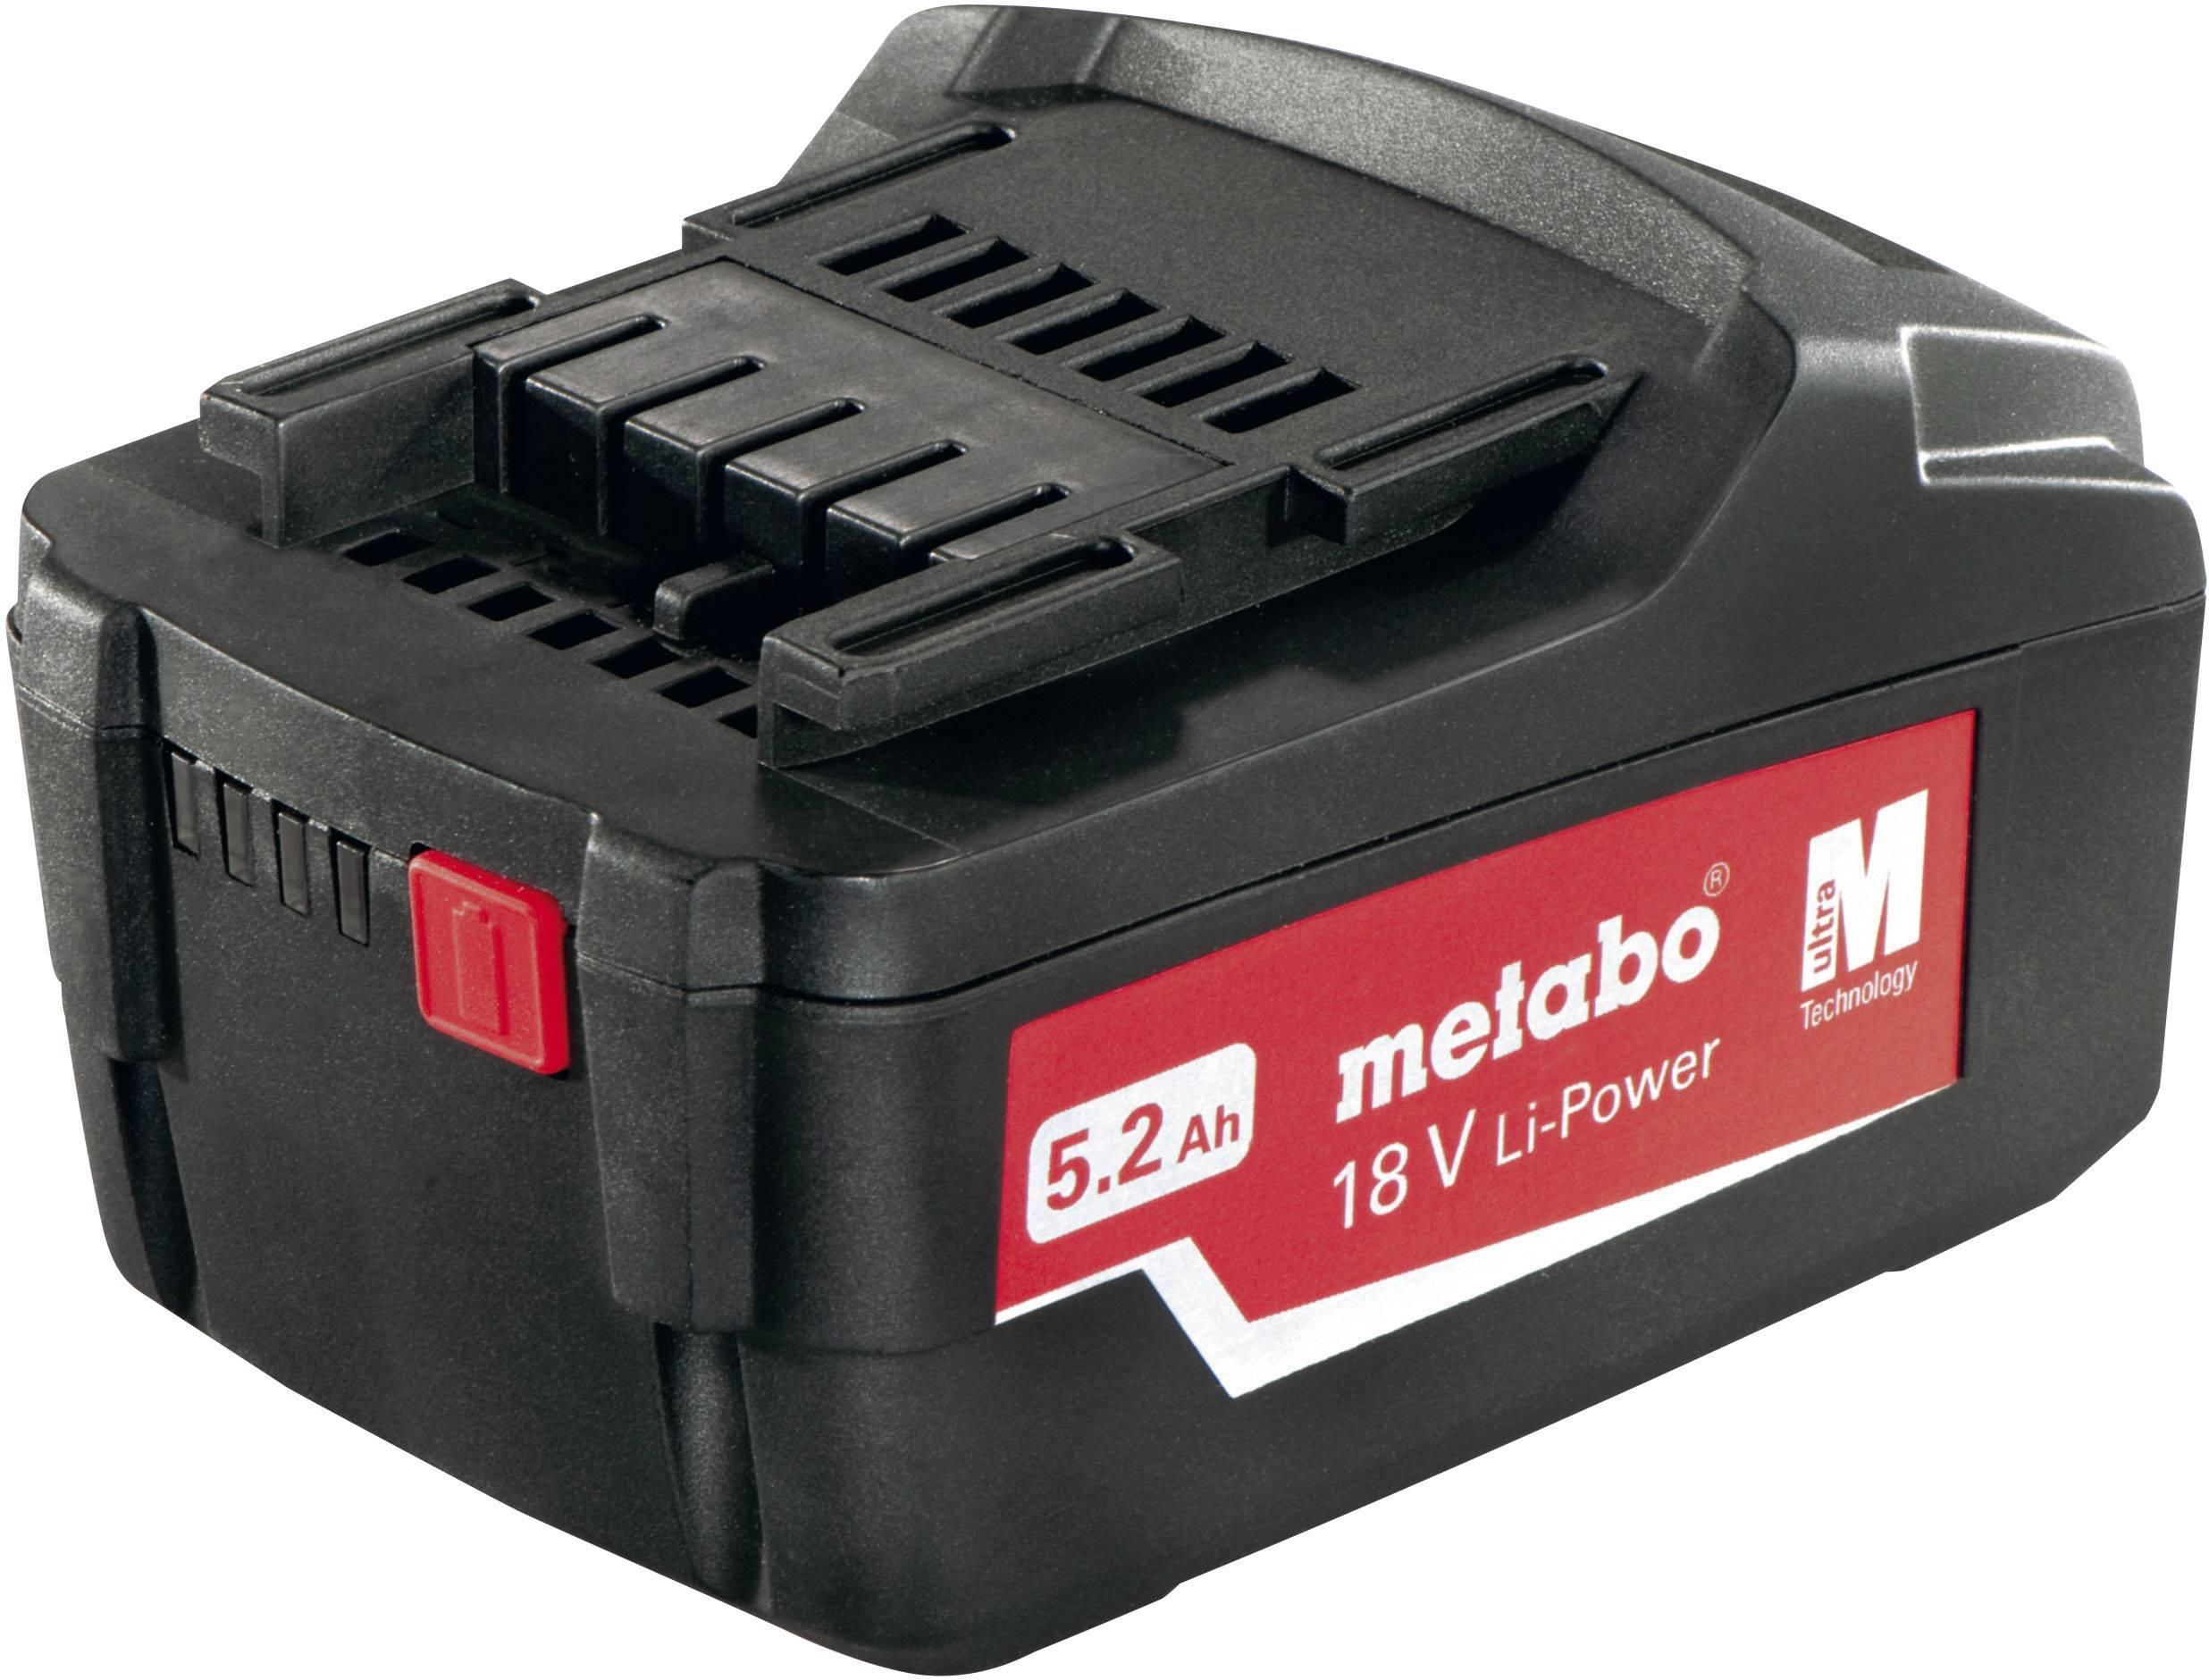 Akumulátor Metabo, 18 V, 5.2 Ah, 6.25587.00